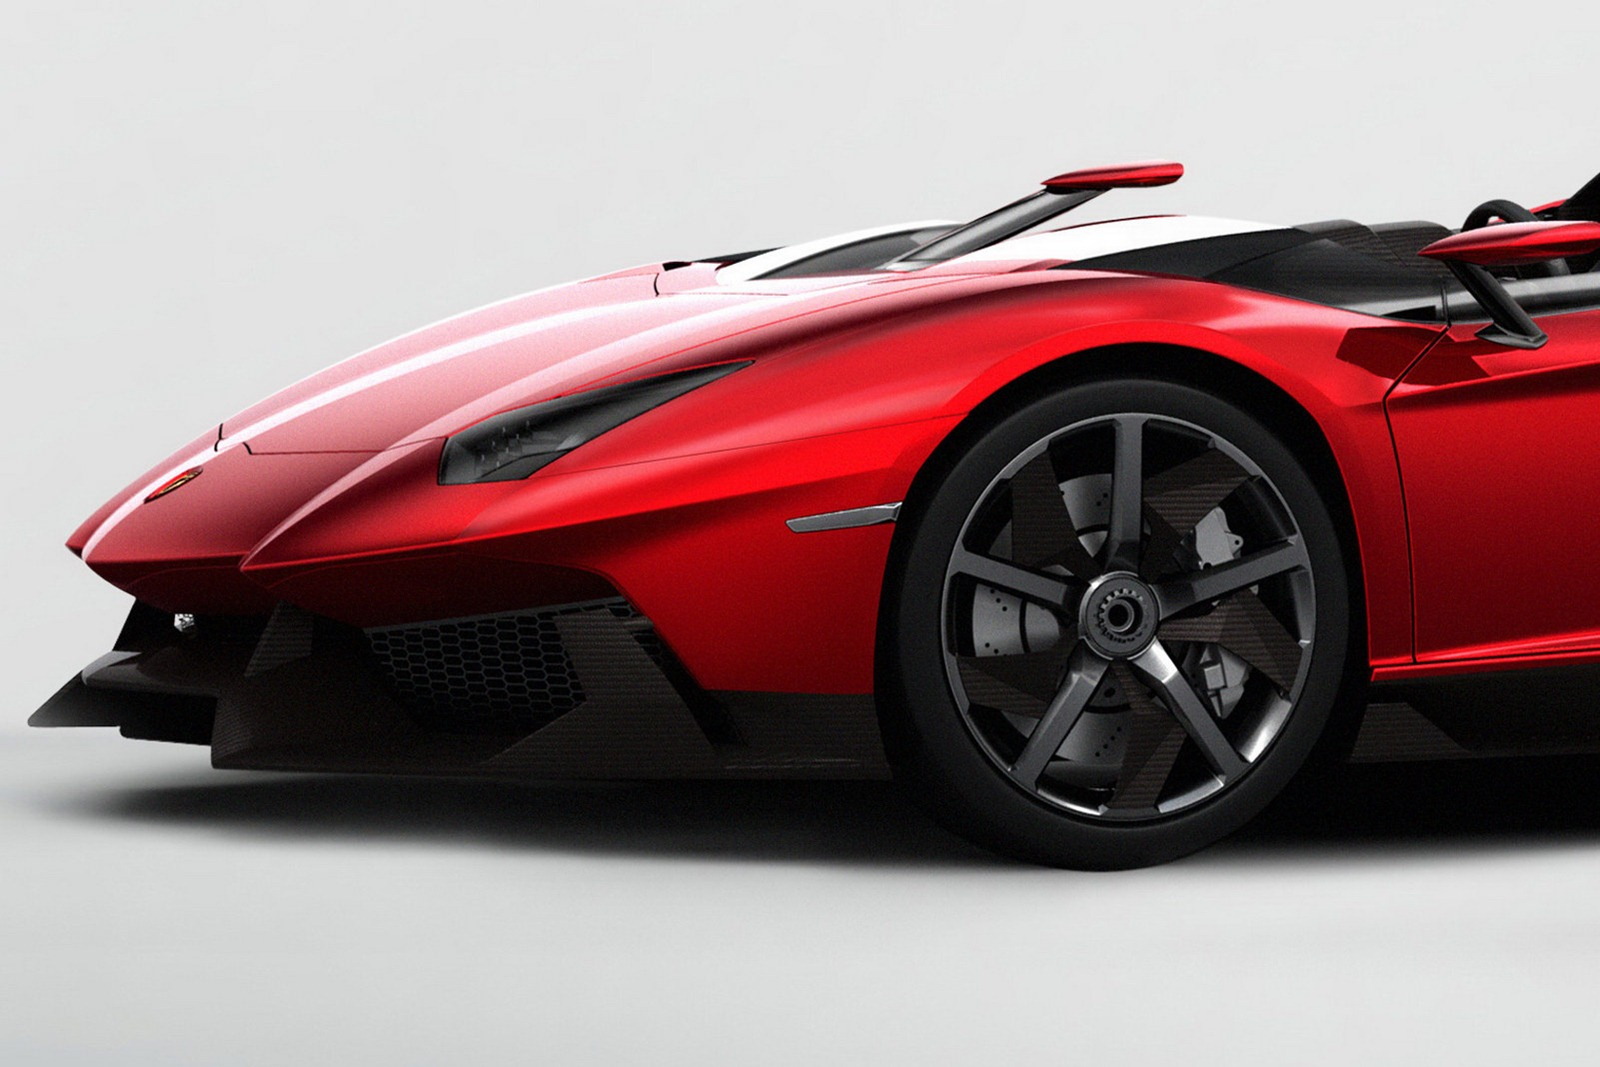 http://1.bp.blogspot.com/-8Prwy4rEl60/T1d4moYV4rI/AAAAAAAACV8/kxB02l8zNHI/s1600/Lamborghini-Aventador-J-Speedster-wallpaper_9.jpg